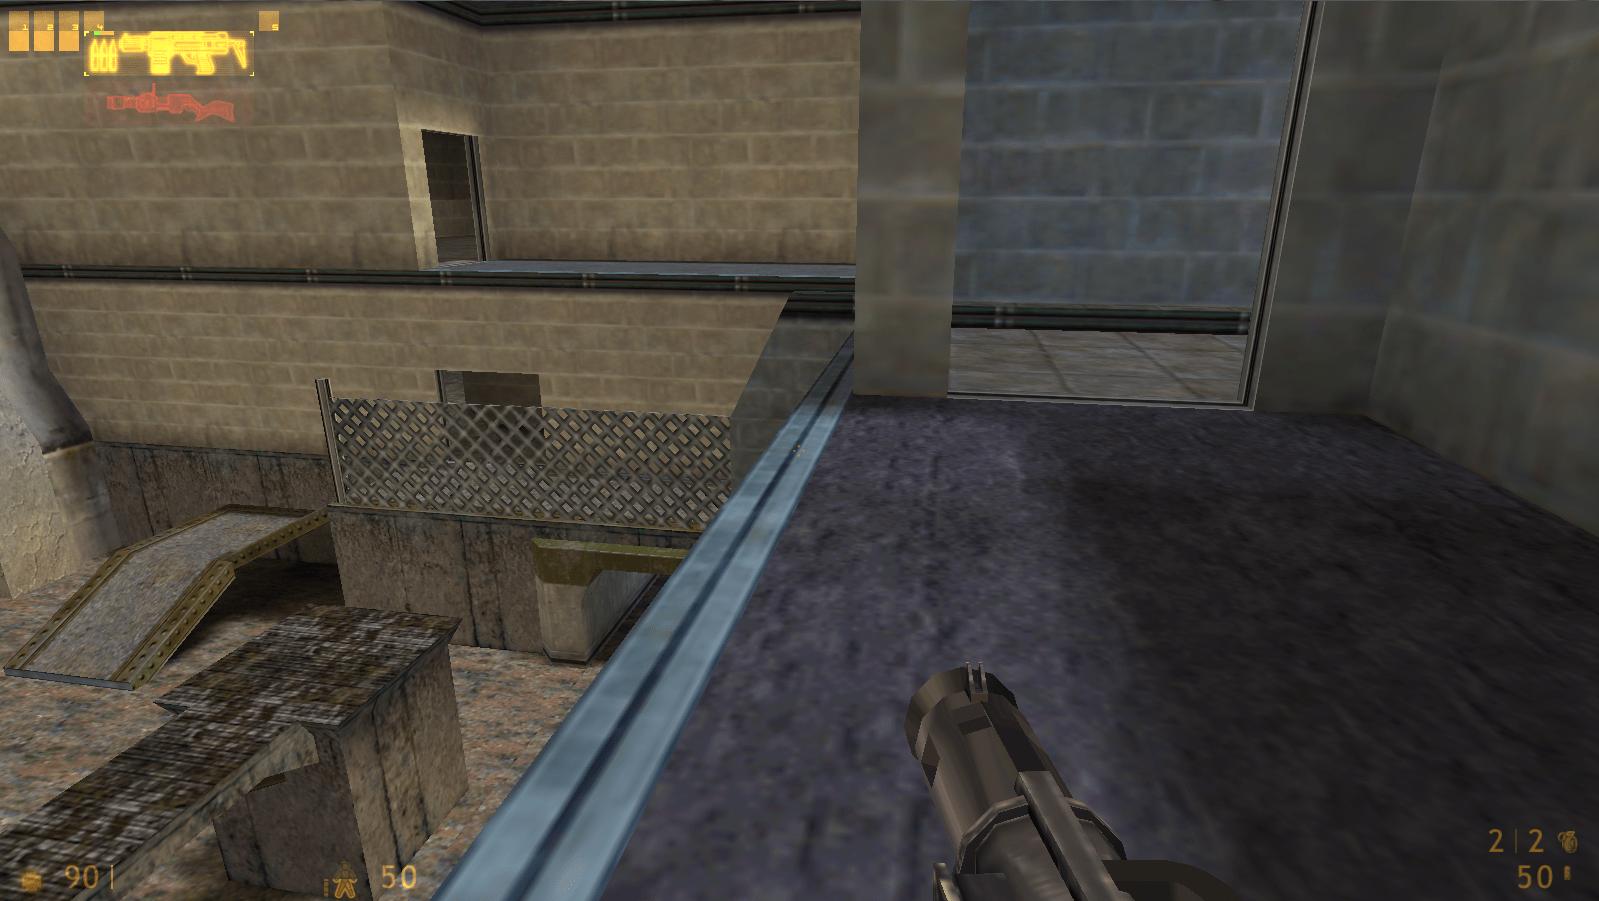 Infinite hand grenades 2